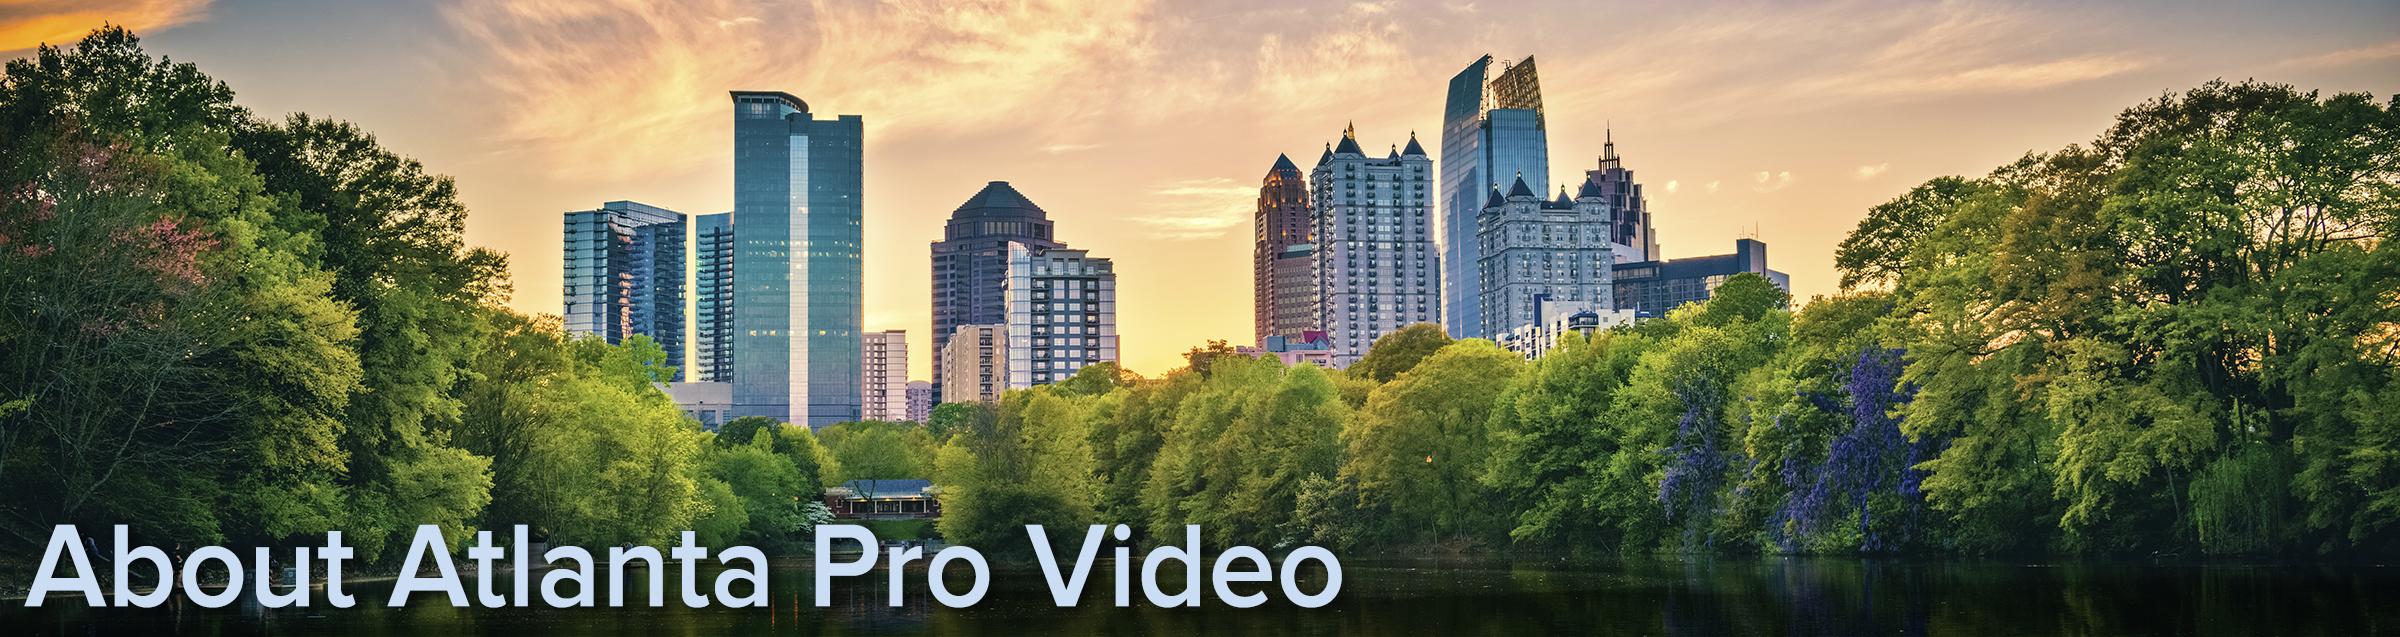 VideoProductionEditingAtlantaFilmPro